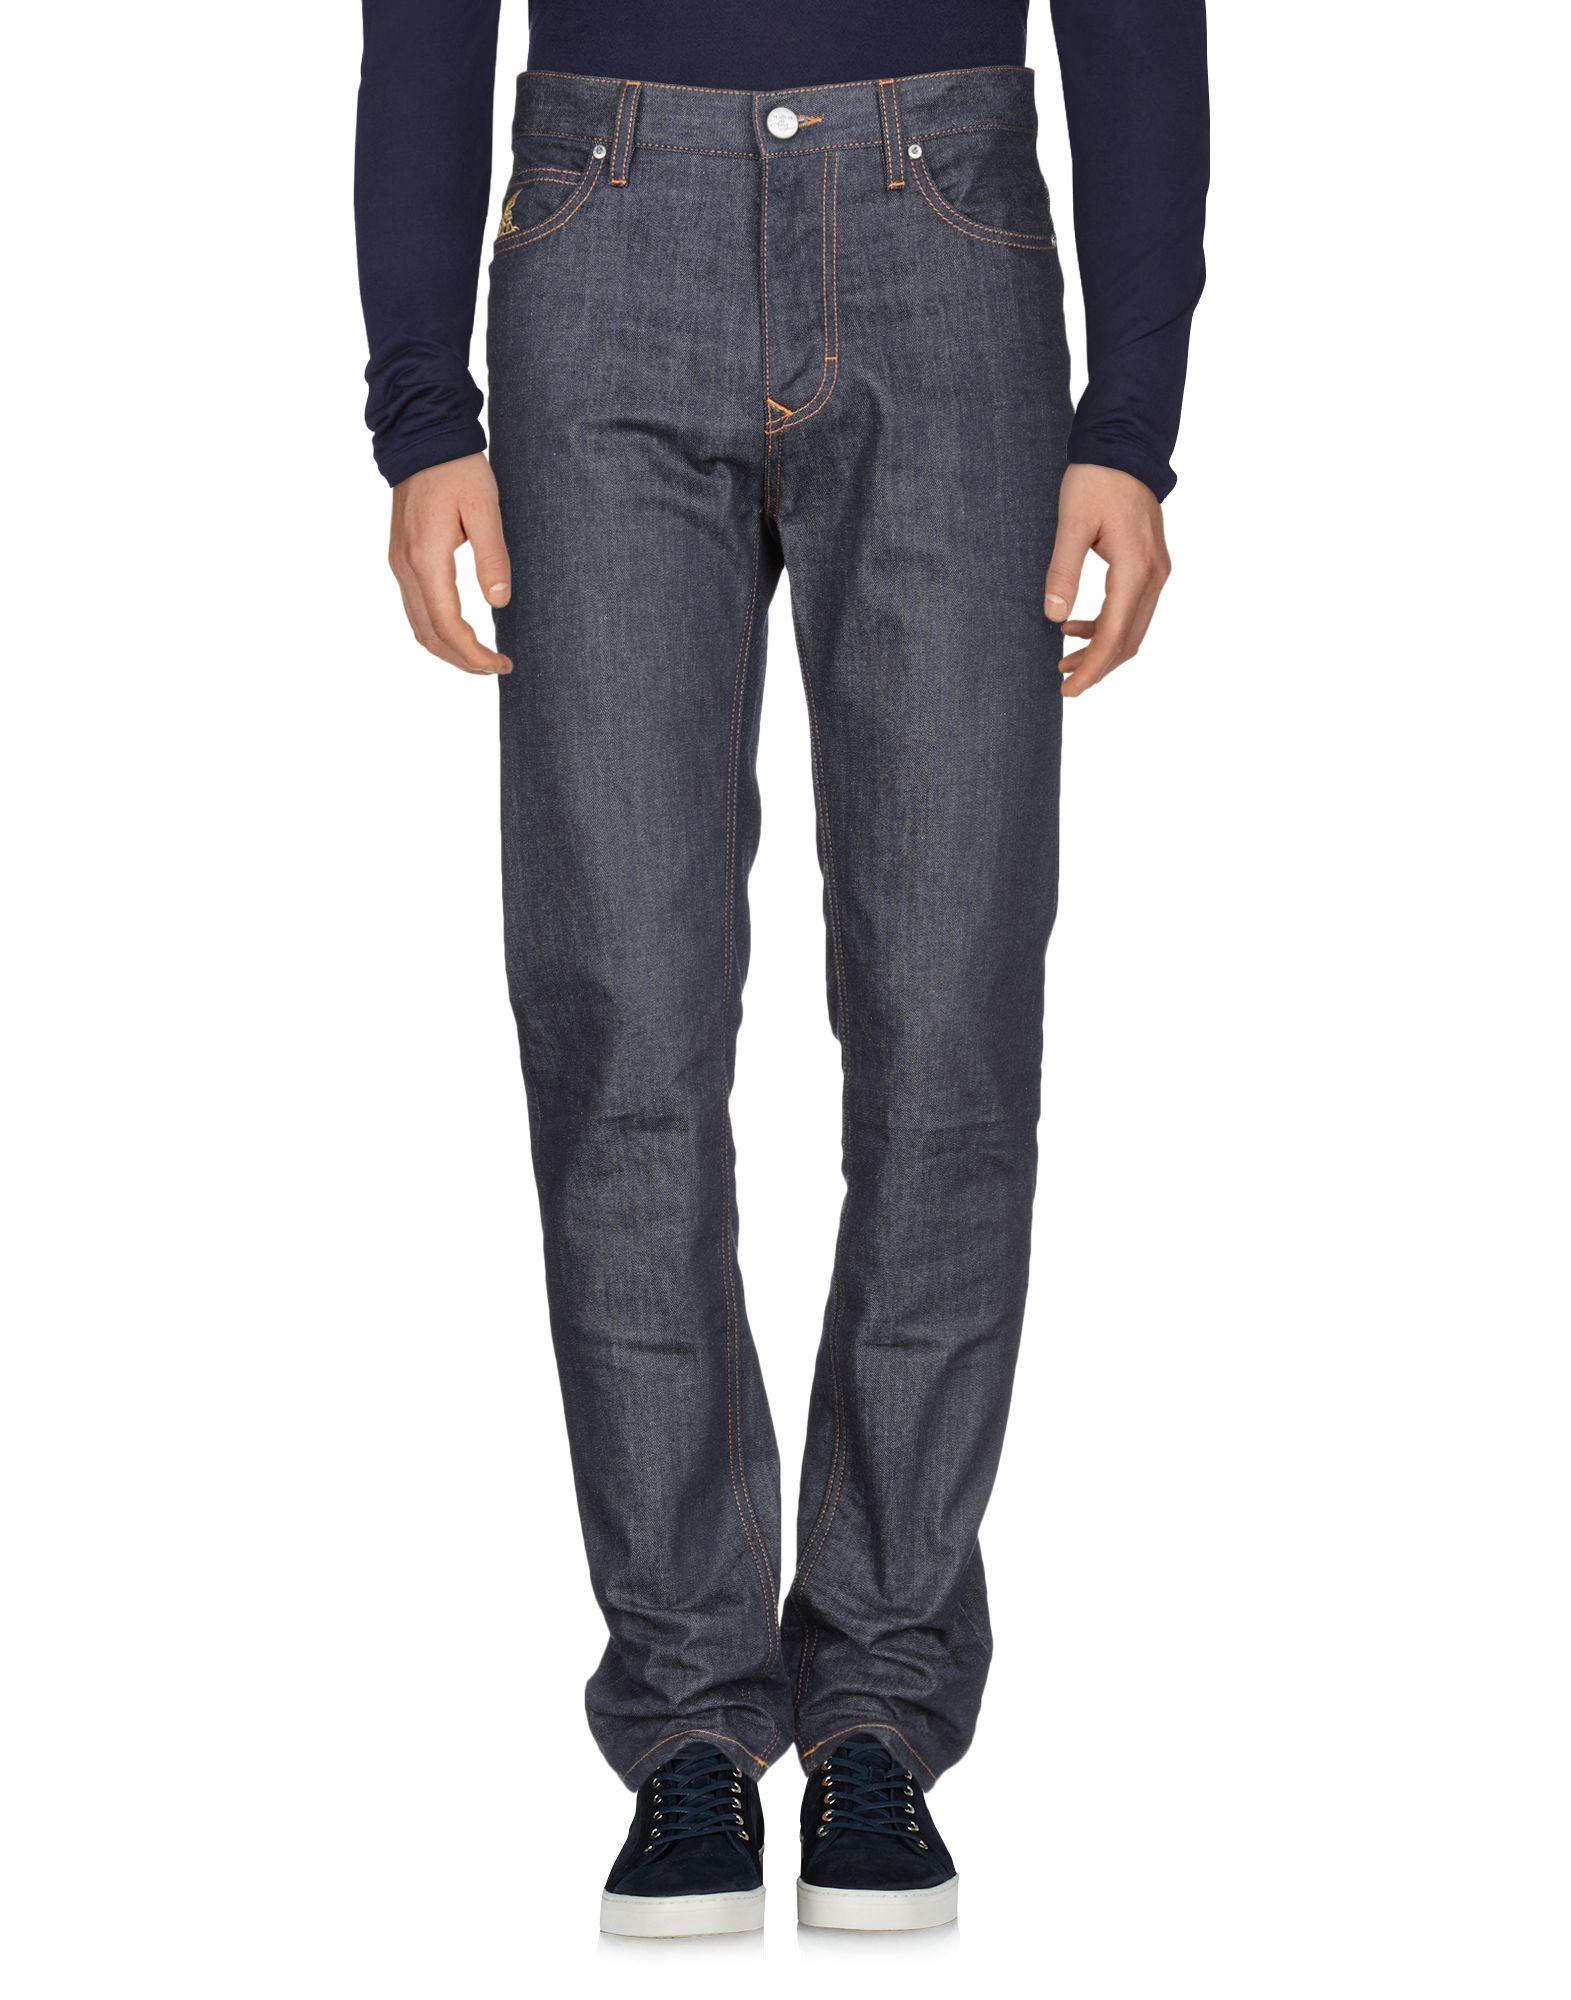 Pantaloni Jeans Vivienne Vivienne Jeans Westwood Anglomania Uomo - 42685208GK 7af0ee